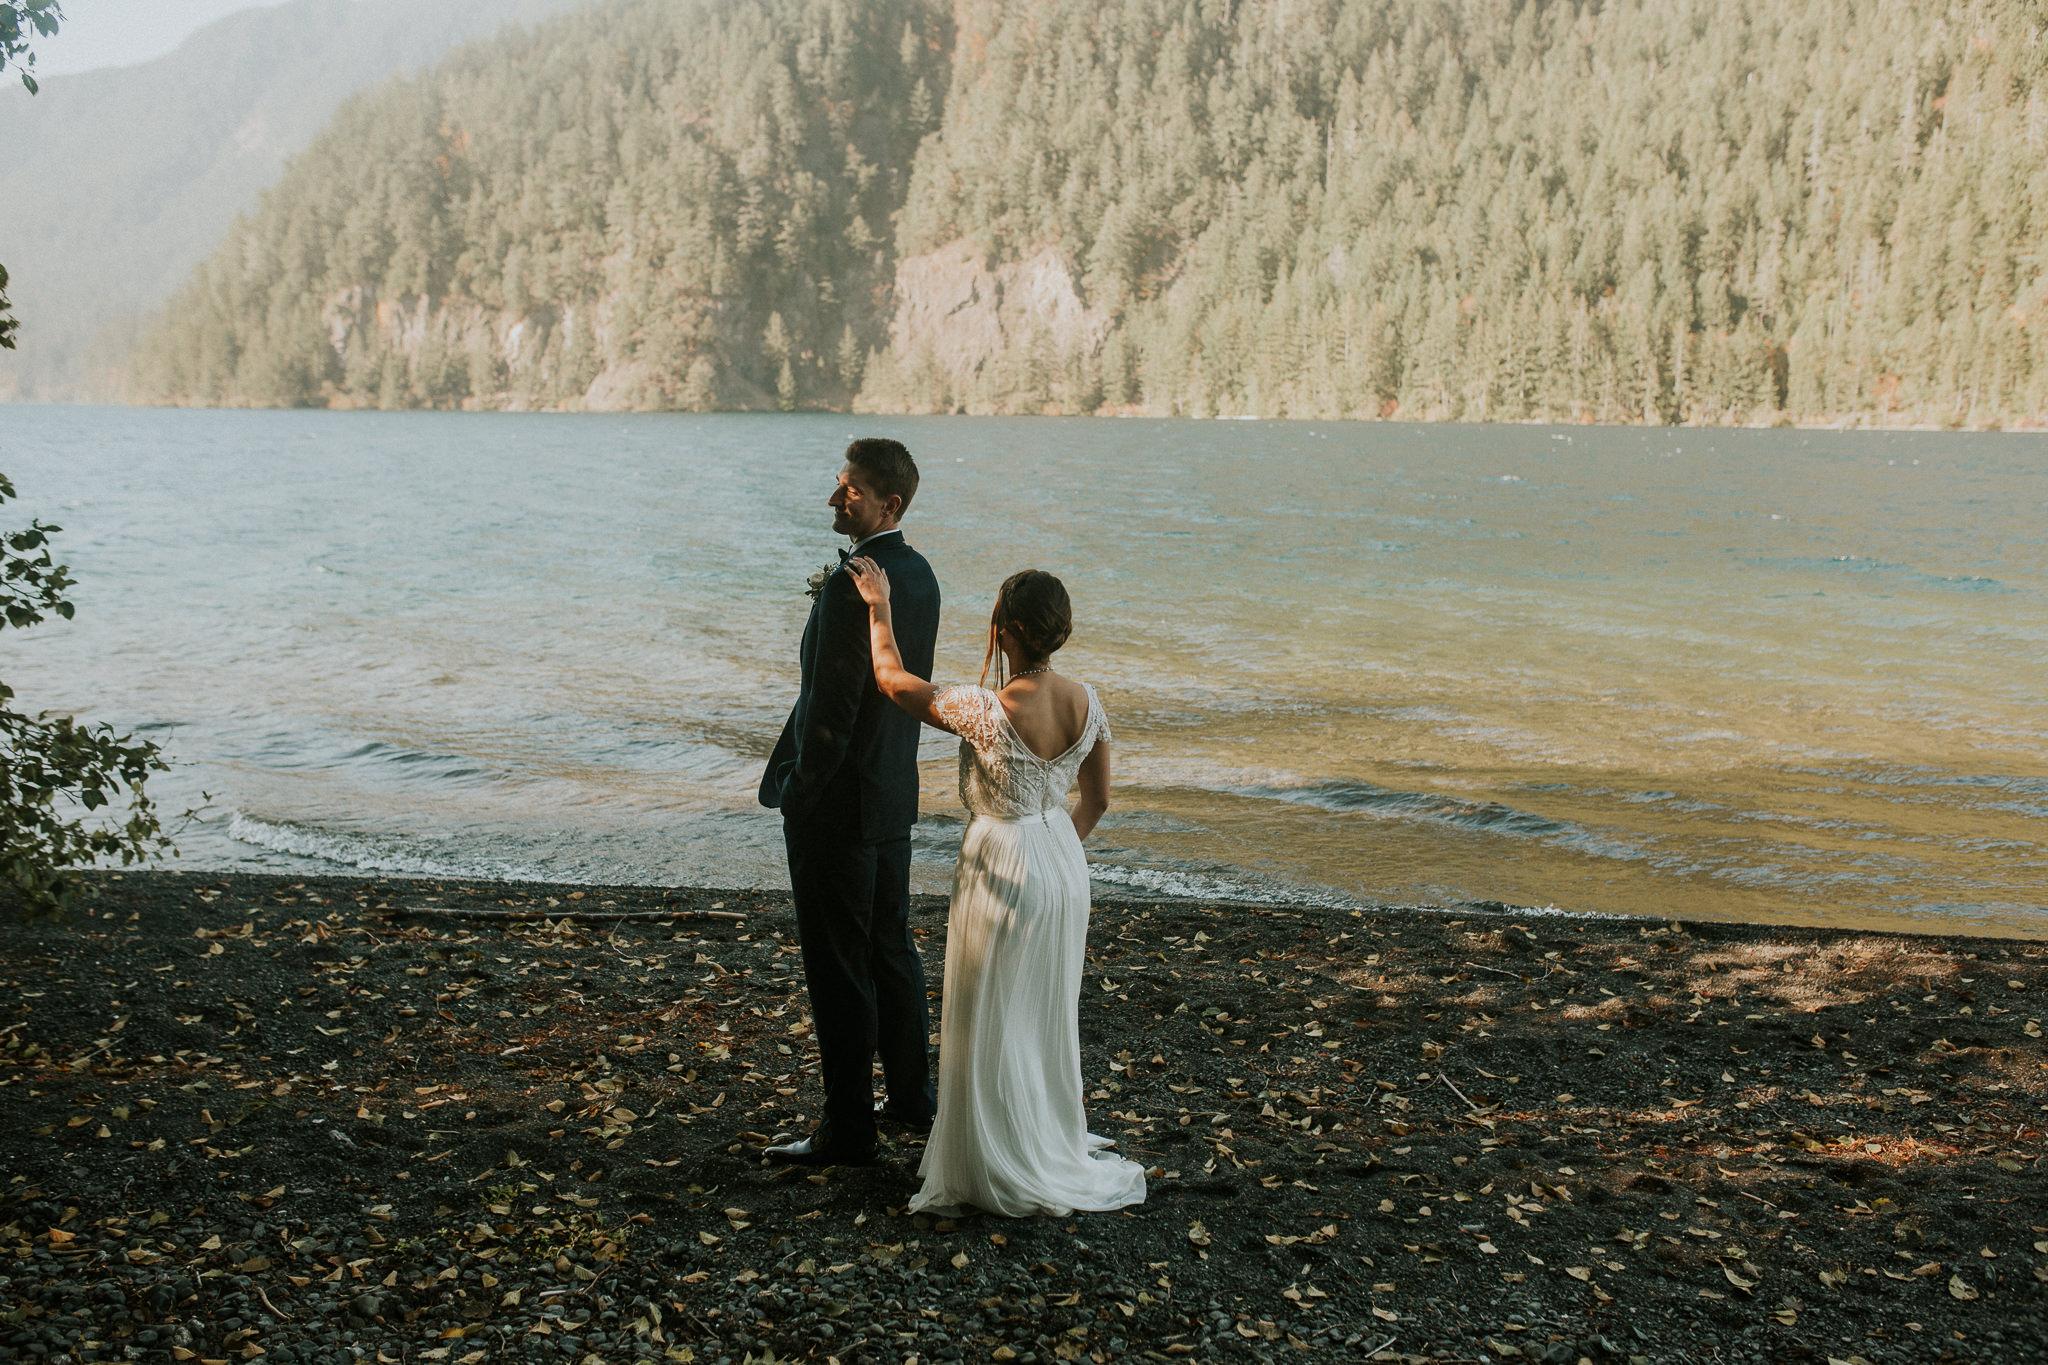 Cresent-lake-elopement-BreeAnna-Lasher-13.jpg